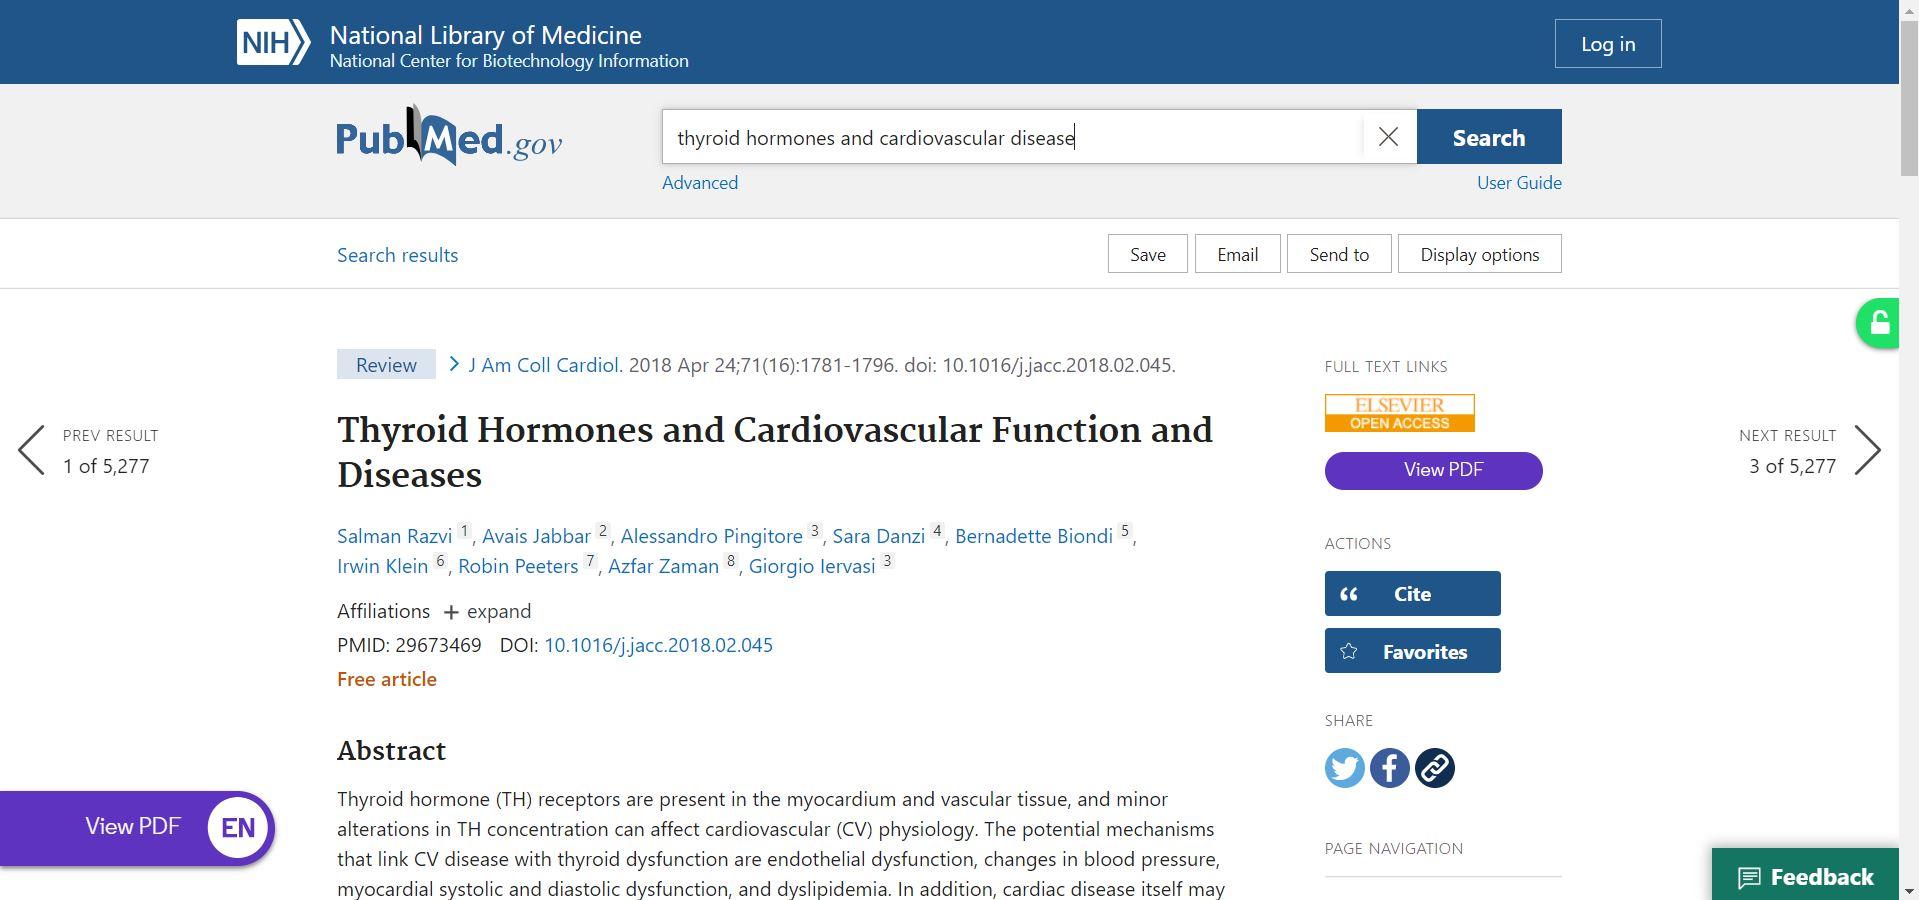 Access full text articles through EndNote Click